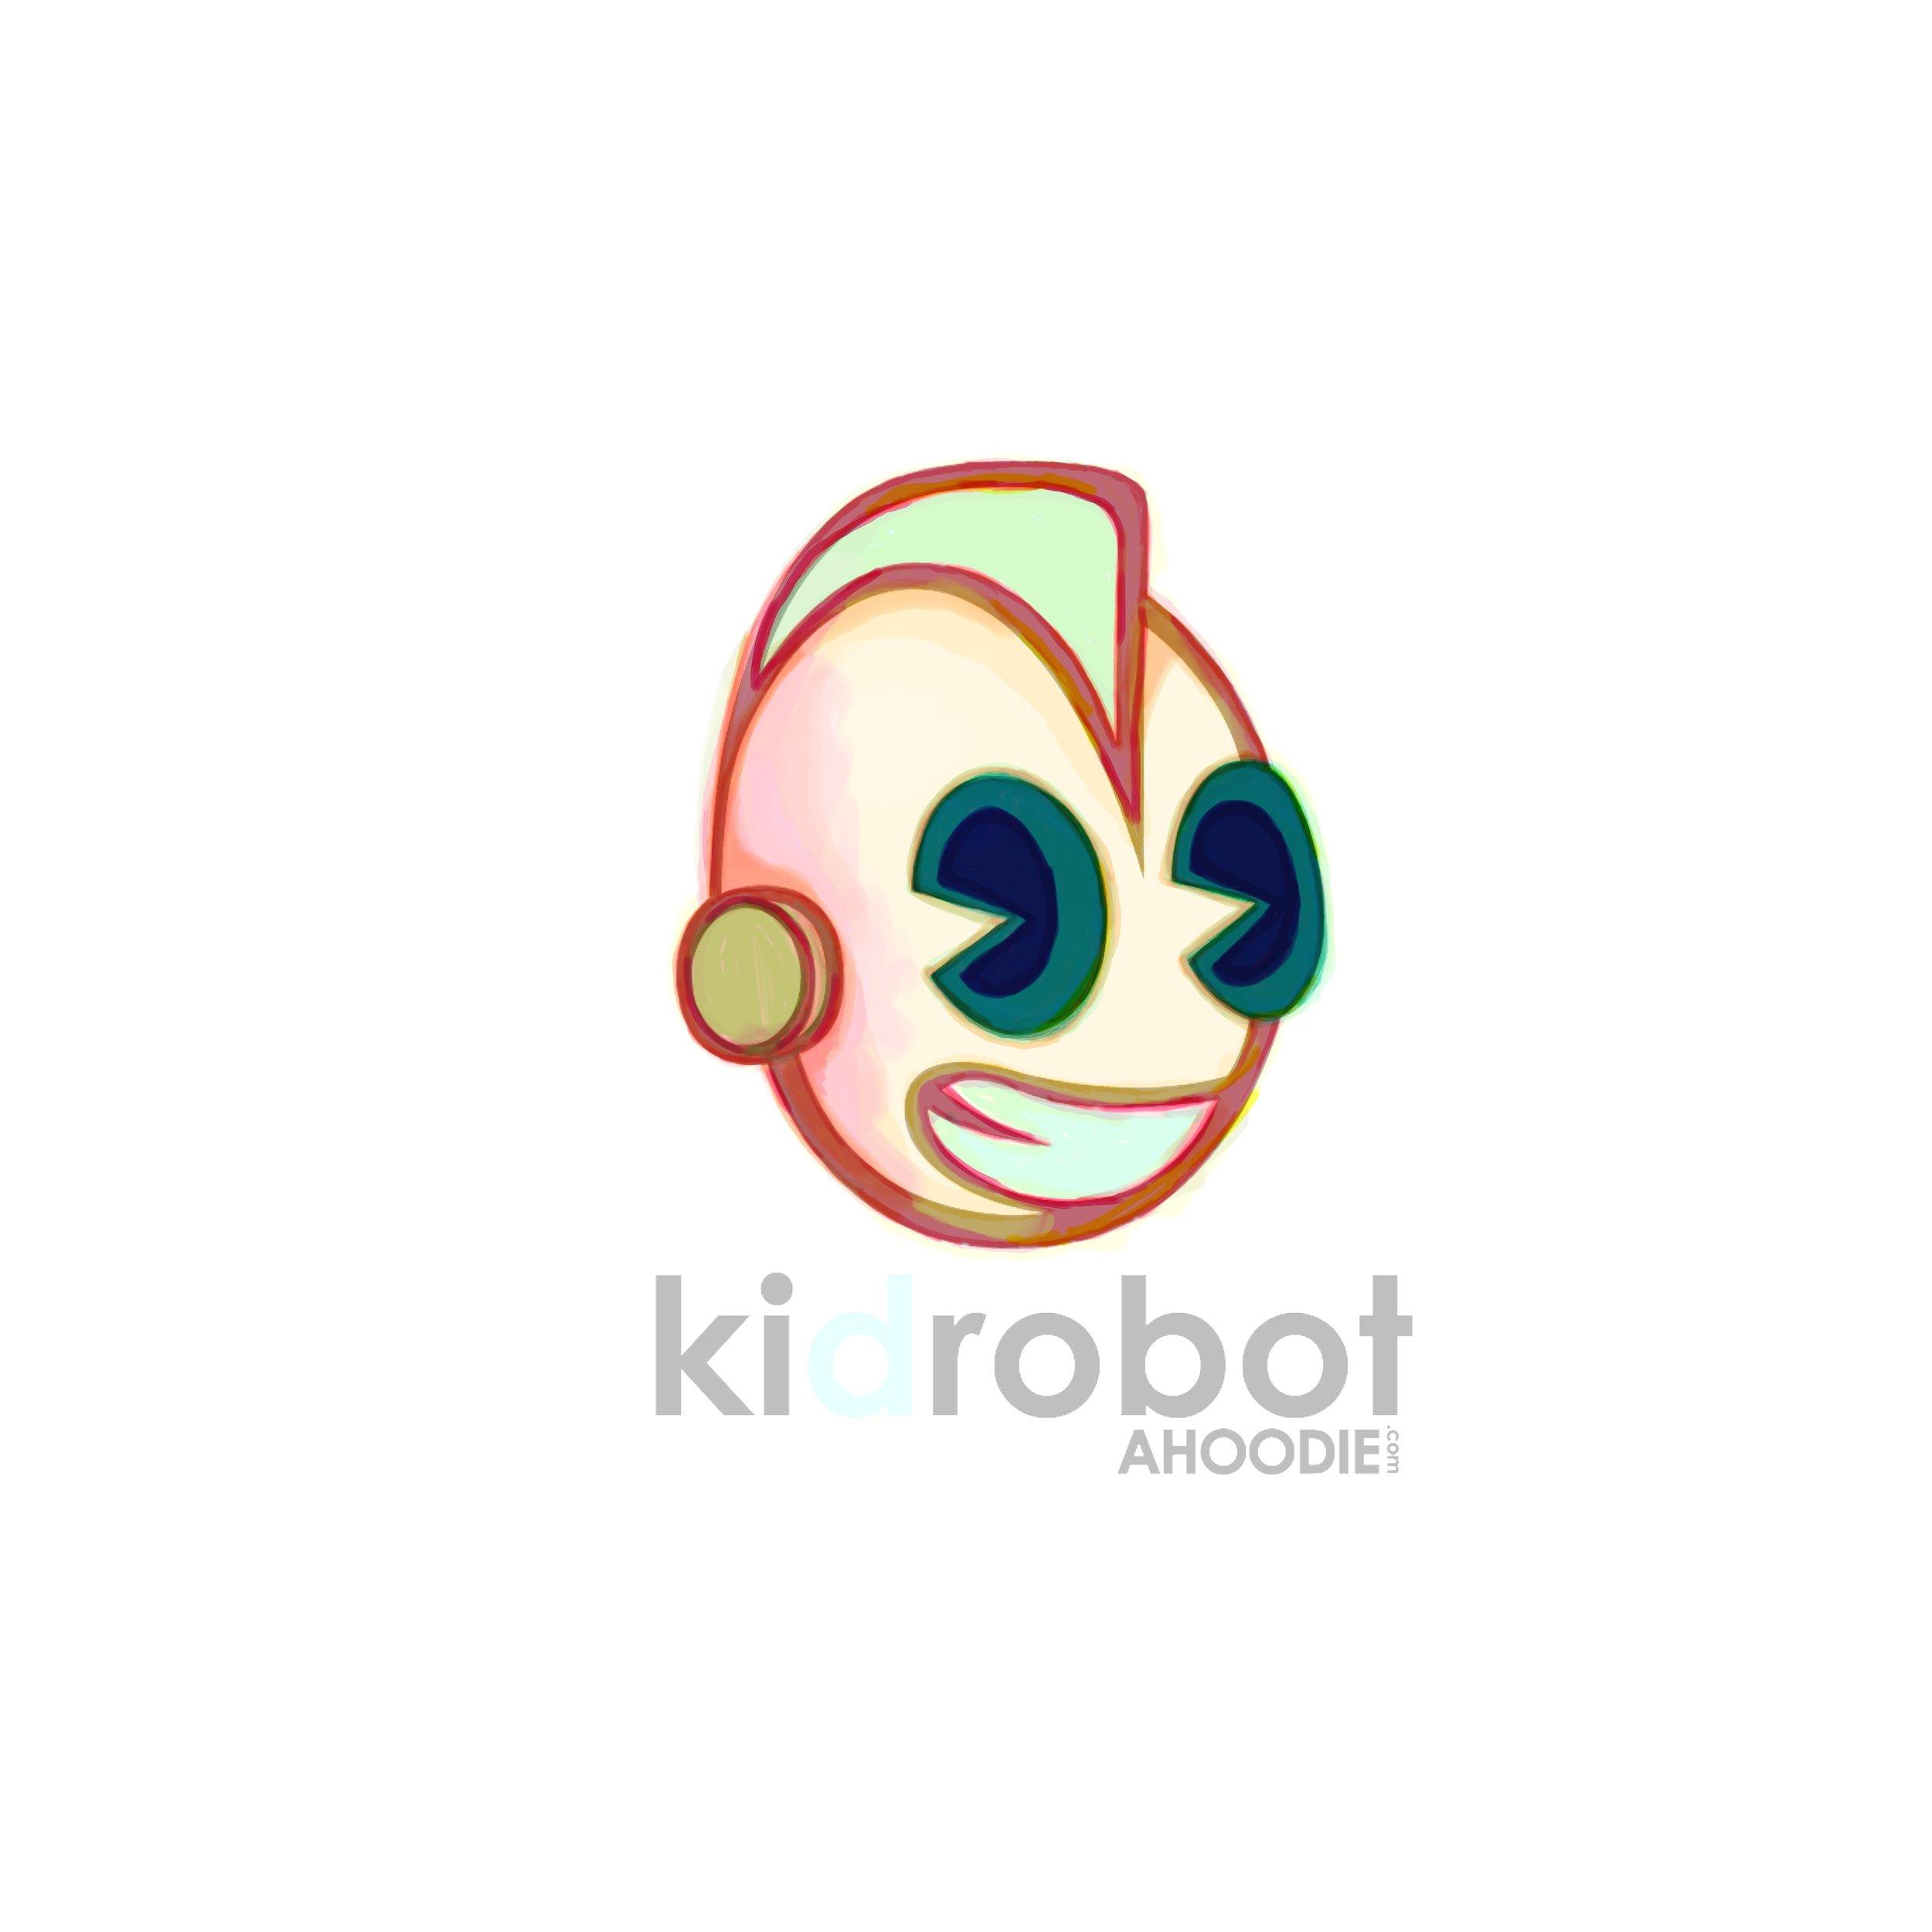 kidrobot08.jpg